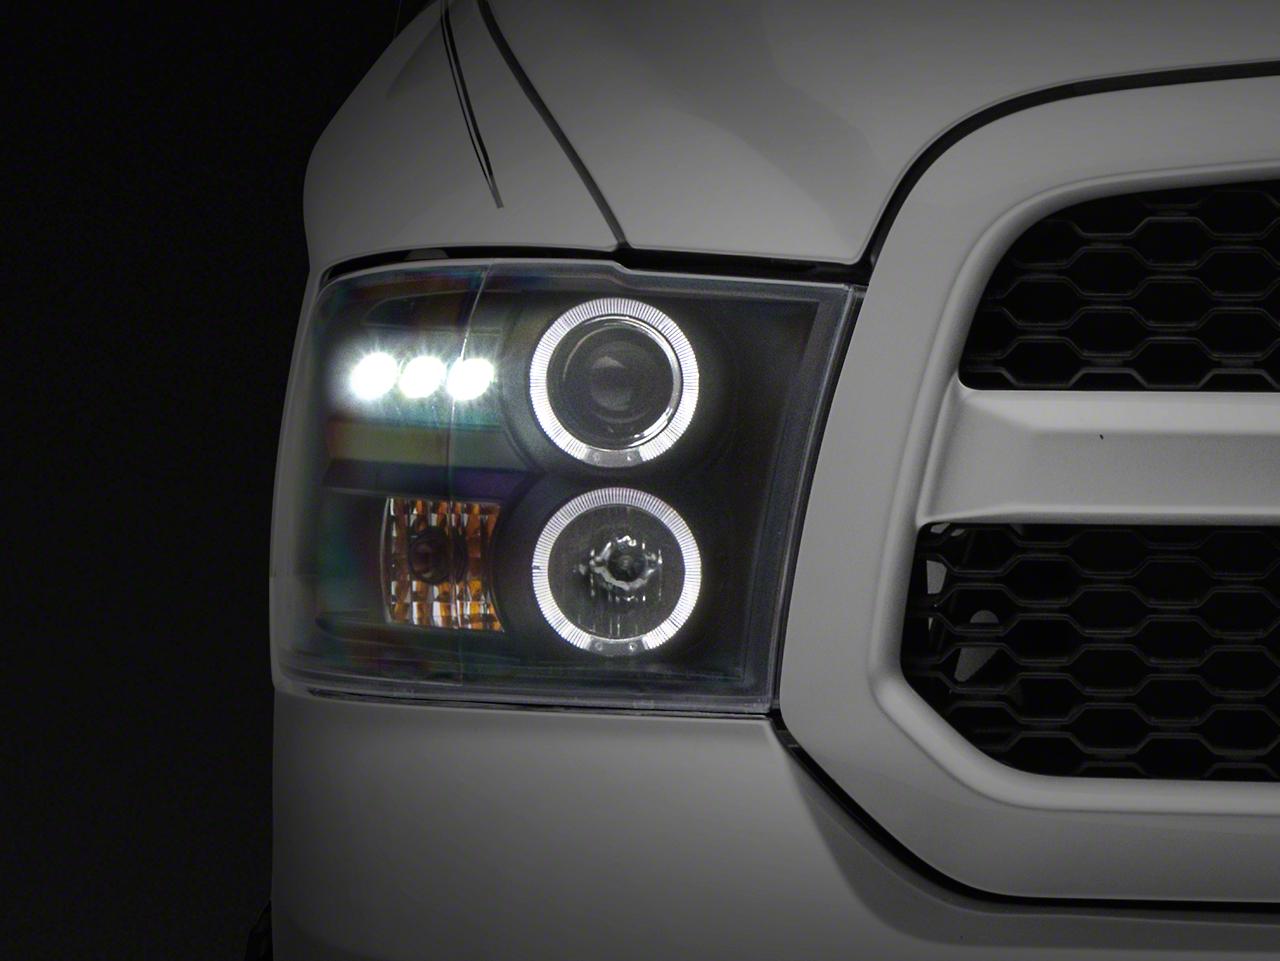 Axial Black Dual Halo Projector Headlights w/ LED Accent Lights (09-18 RAM 1500 w/o Projector Headlights)